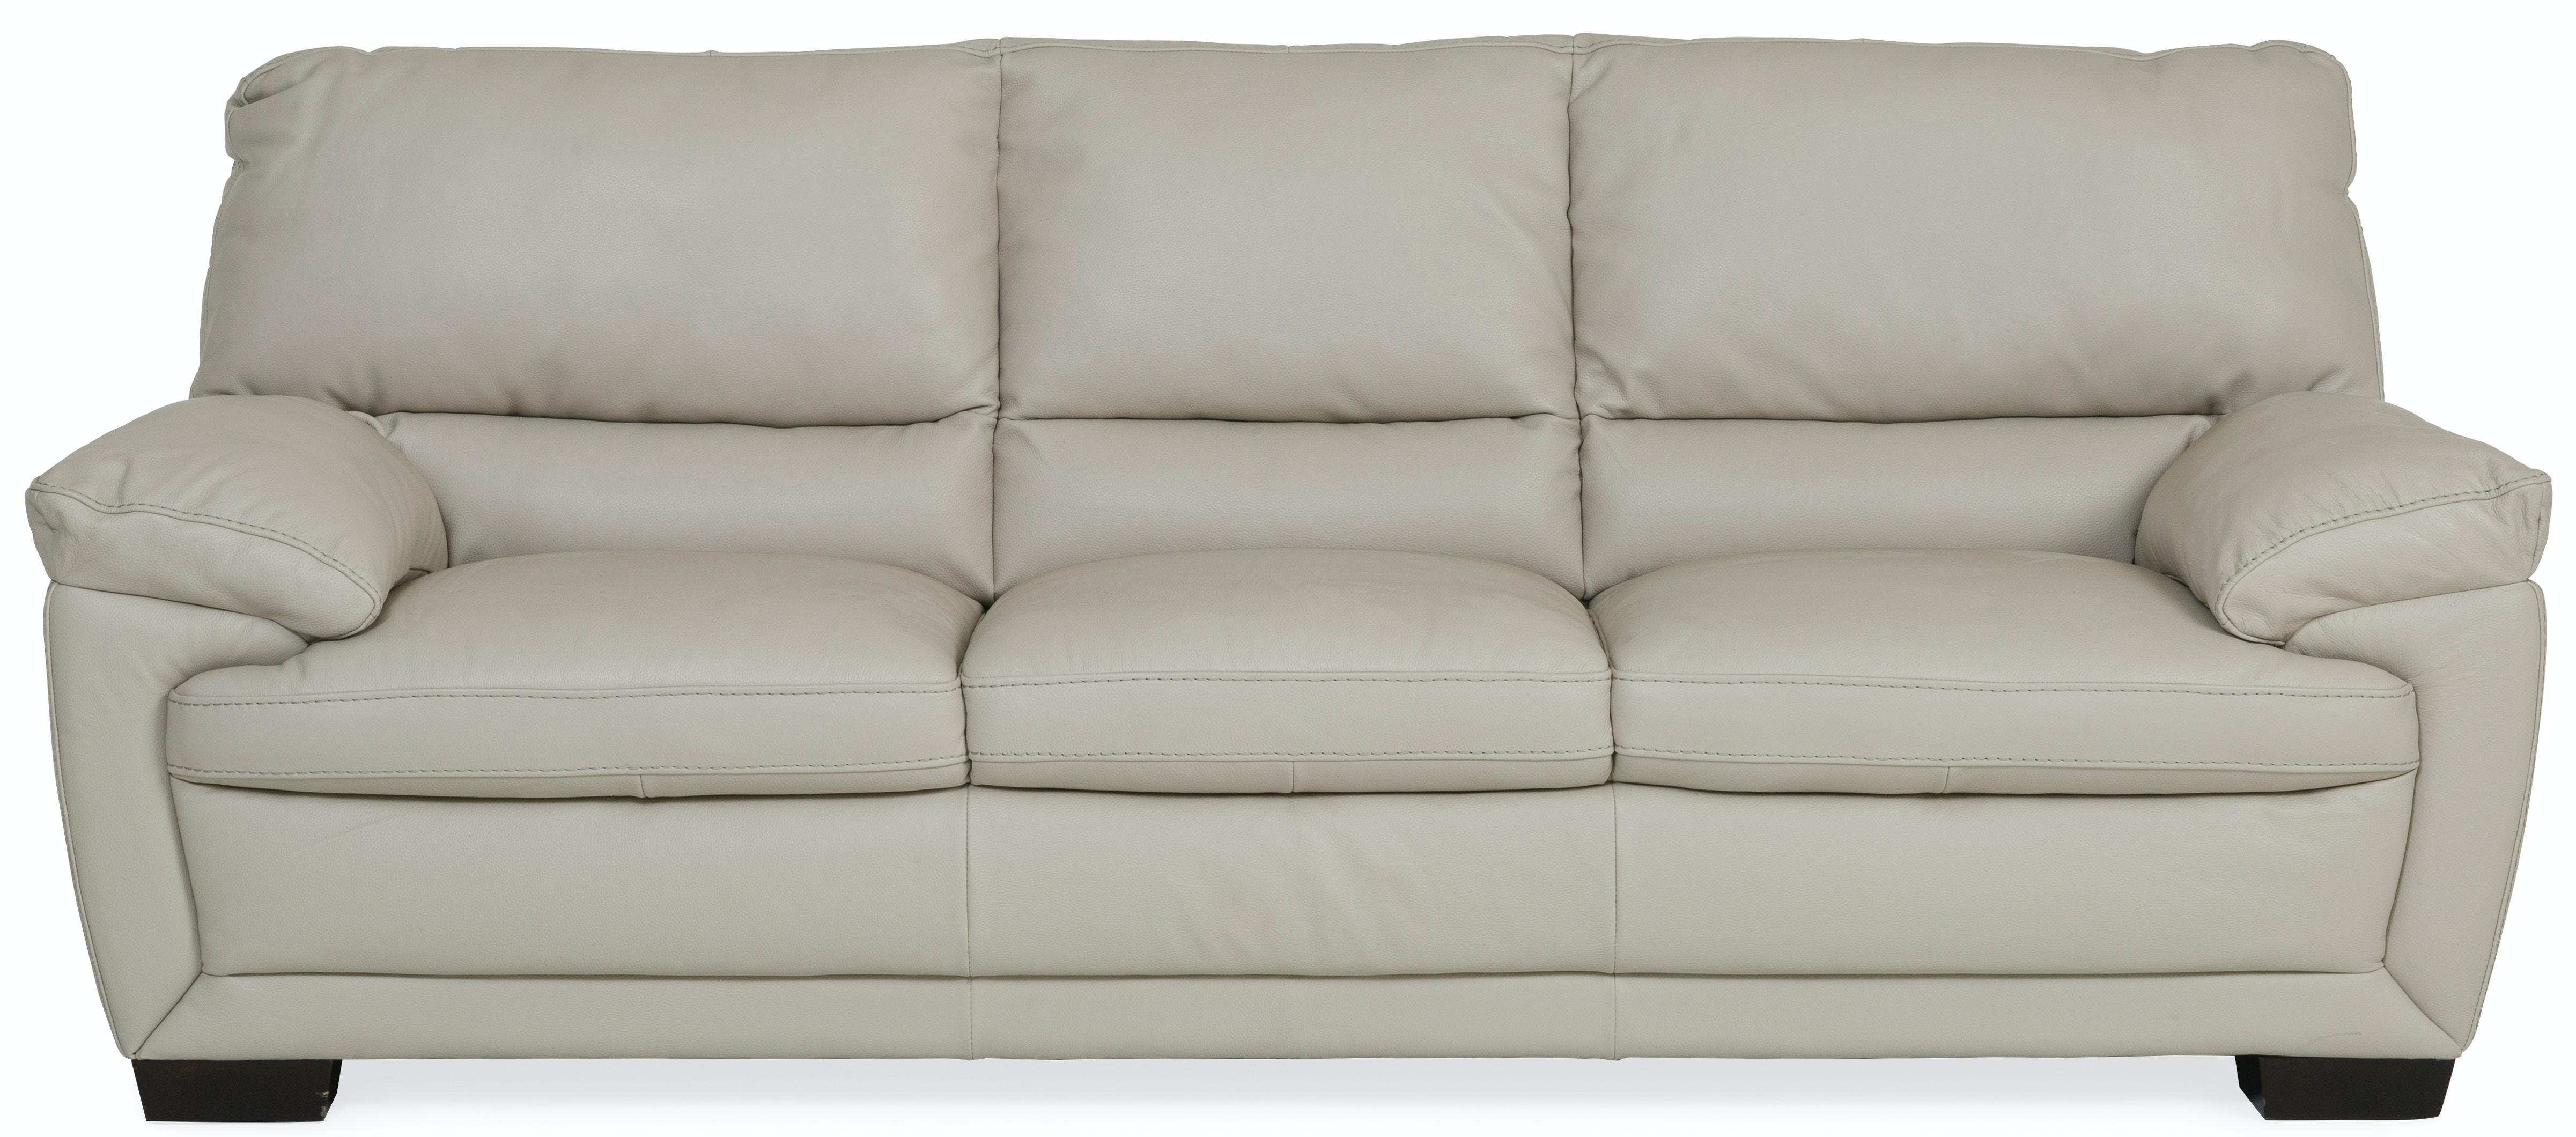 Charmant Denver Leather Sofa   IVORY SMOKE ST:341192